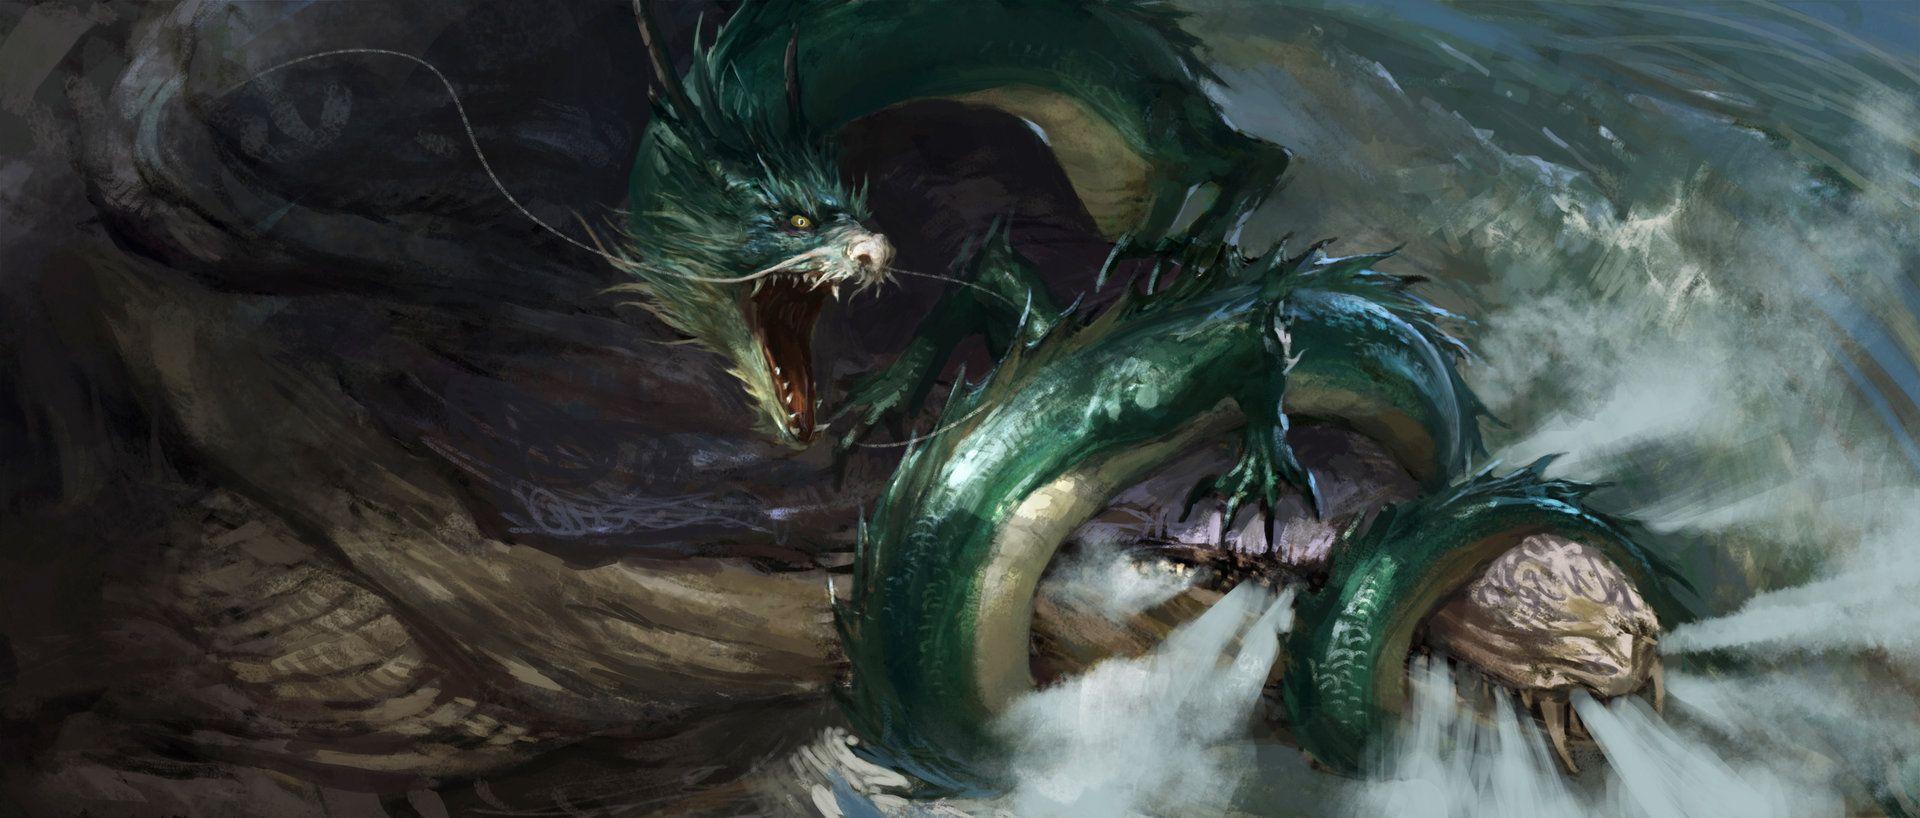 The Stunning Fantasy Artwork of Xiaodi Jin   Digital Artist